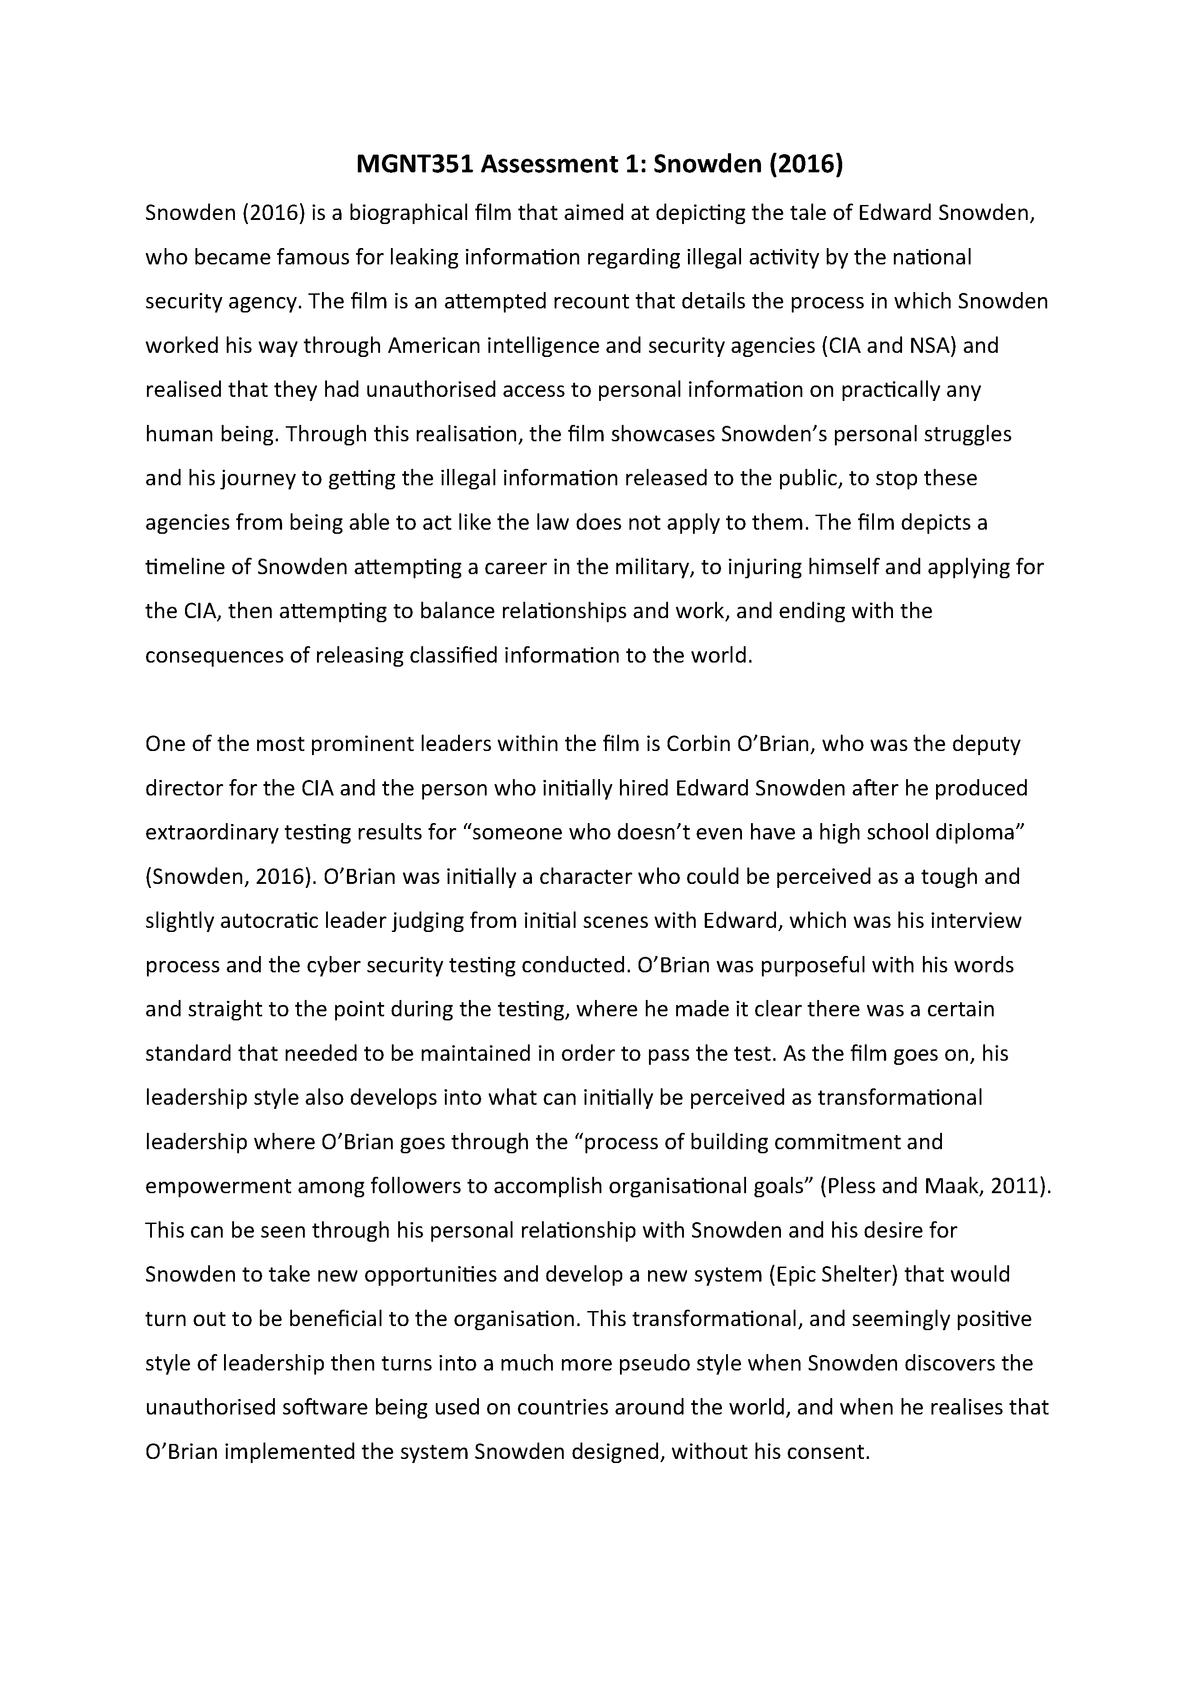 Snowden Essay - MGMT351: Responsible Leadership - StuDocu